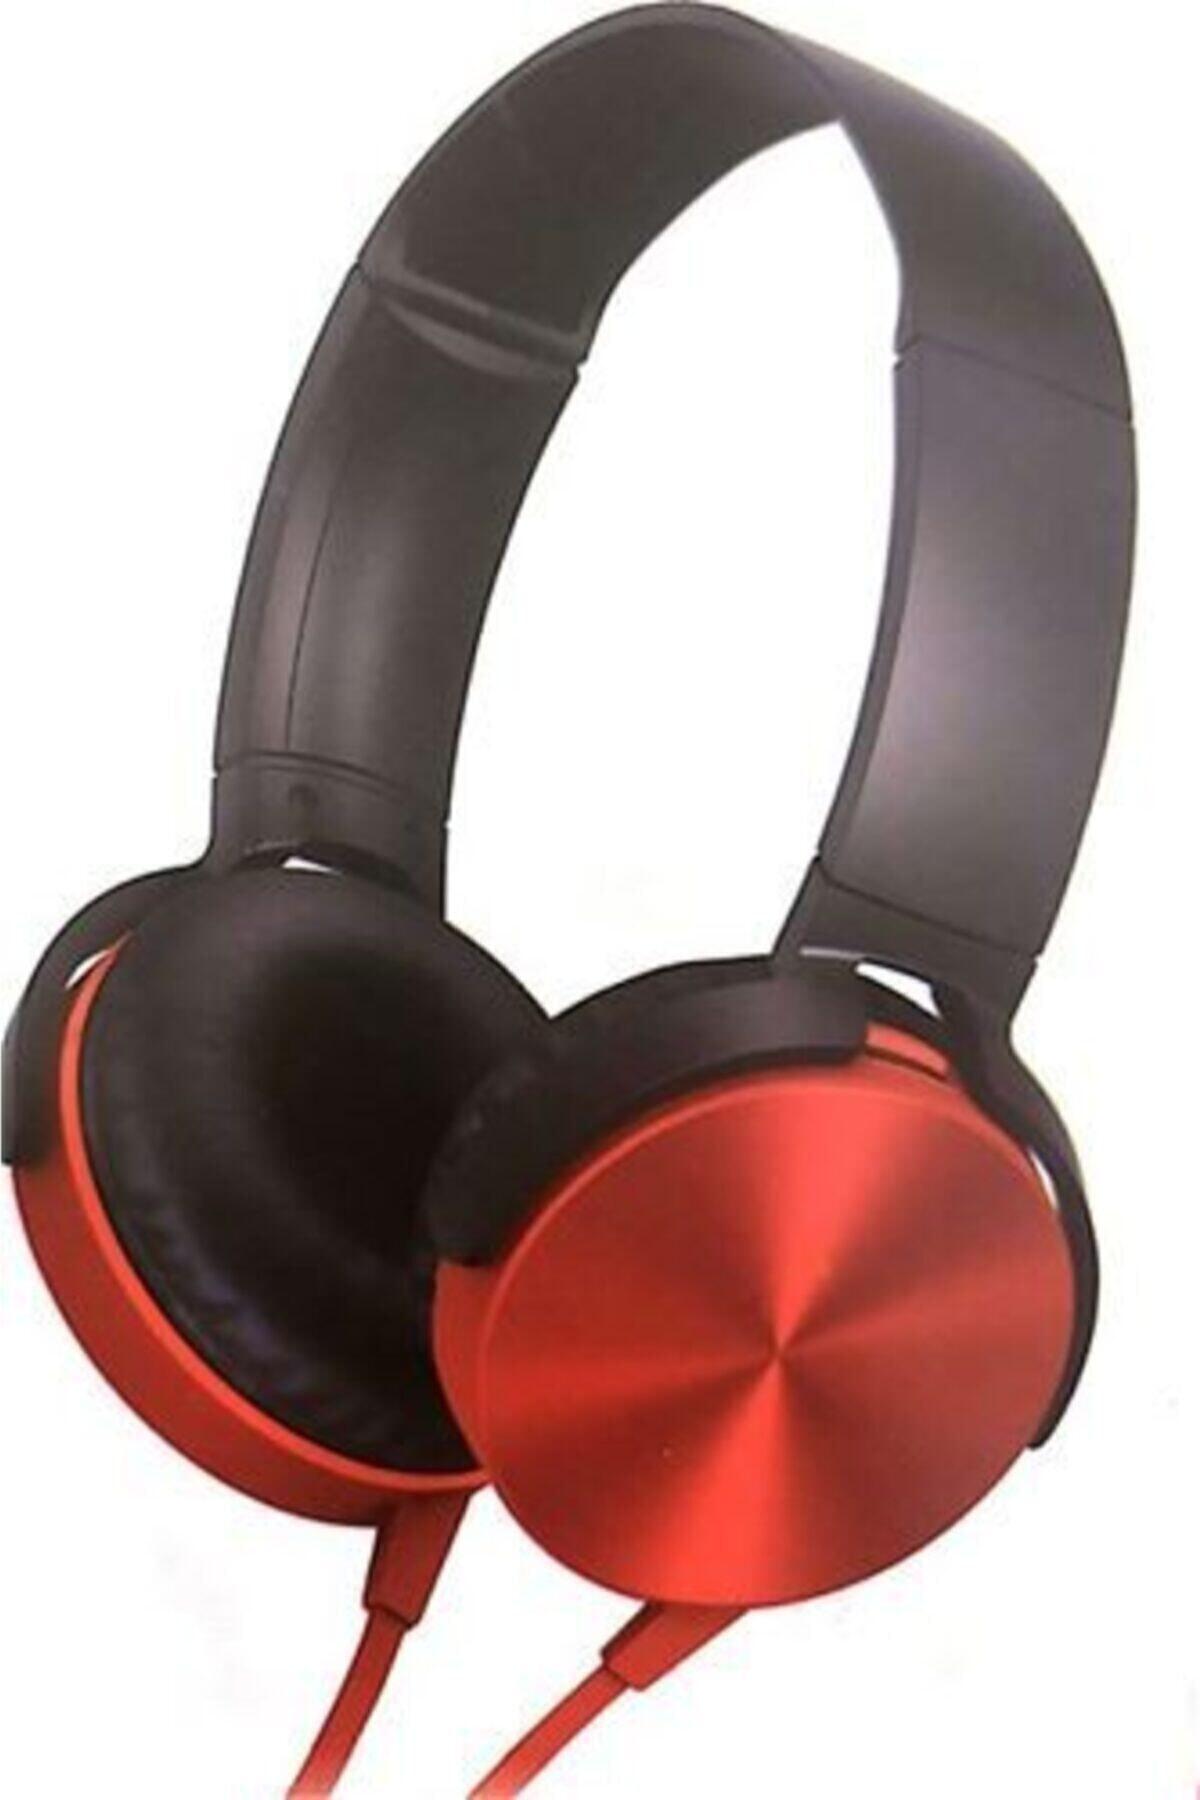 OKMORE Kafa Üstü Telefon Oyun Kulaklığı Extra Bass Son Ses Kalite Stereo Kırmızı 1